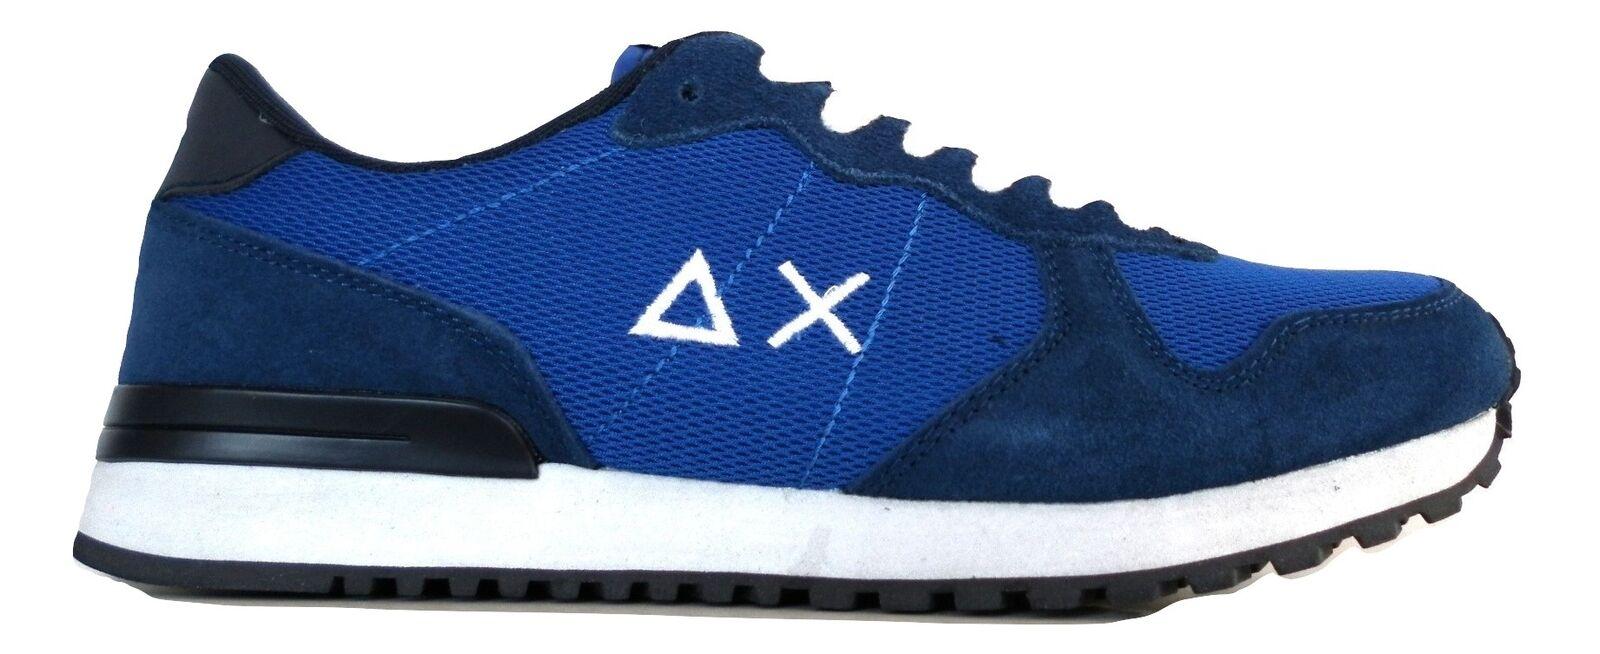 AX SUN68 scarpe unisex scarpe da ginnastica running S0001 58 blu royal